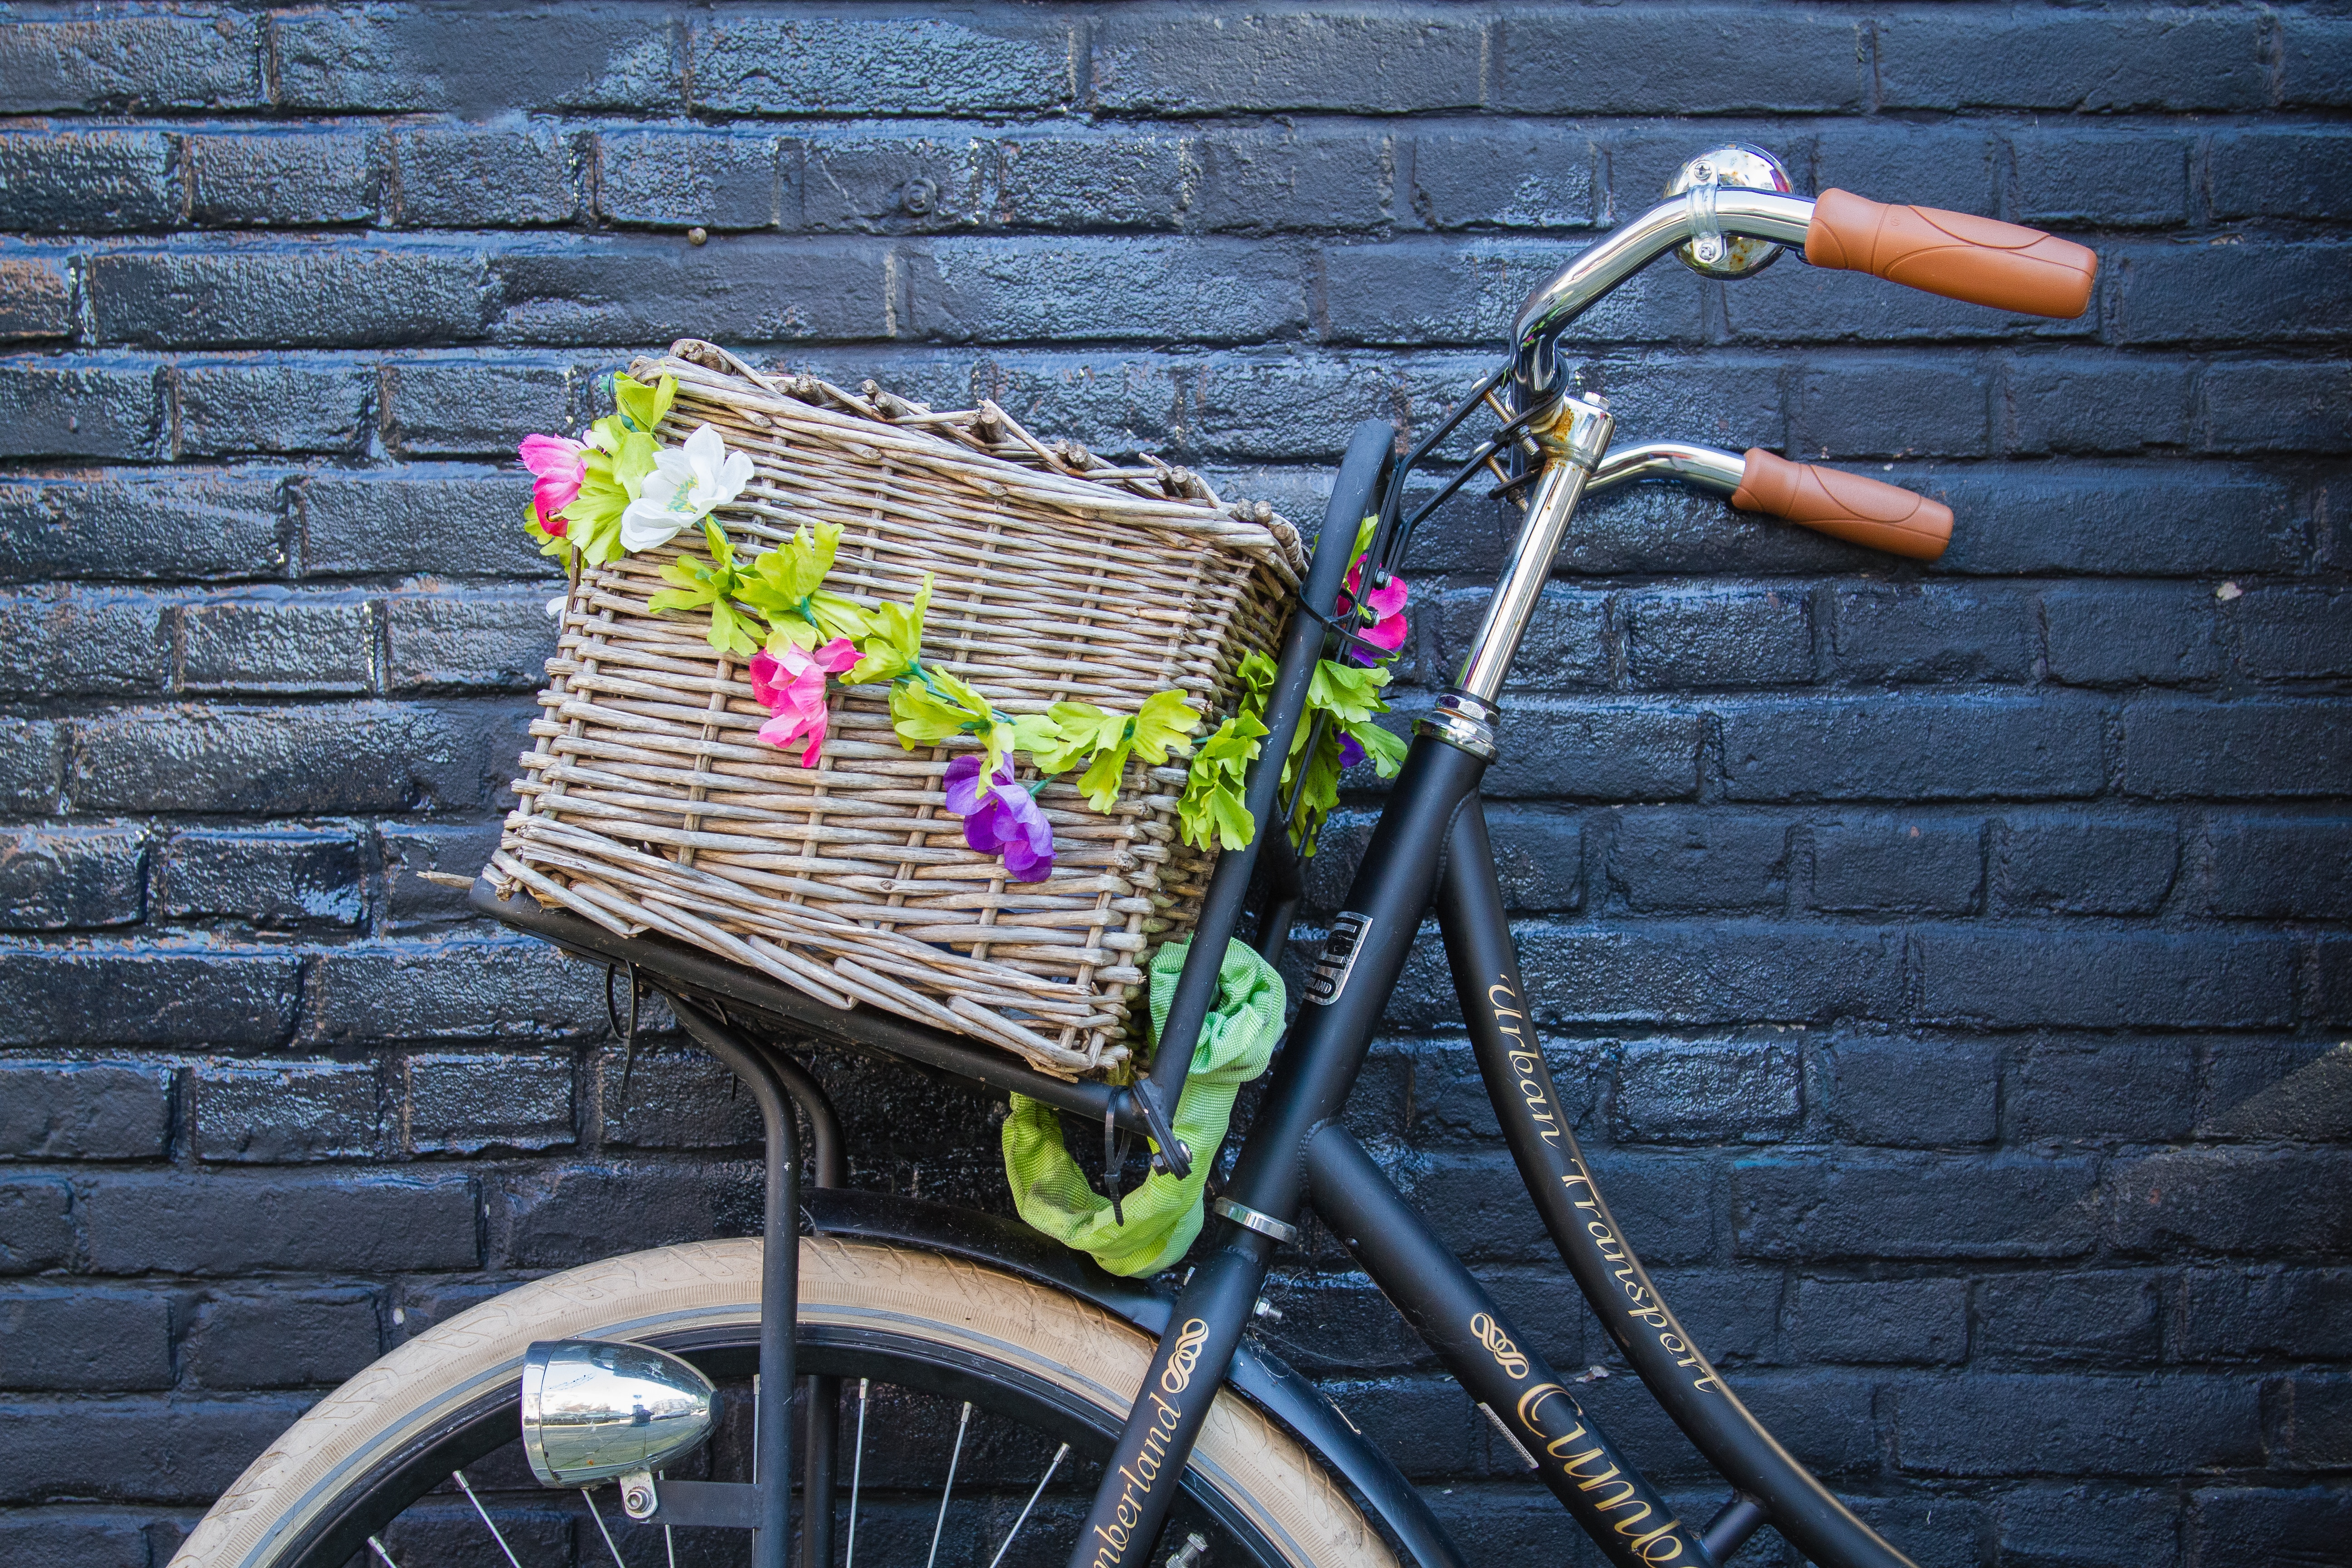 brian harris 603351 unsplash - May is Bike to Work Month!